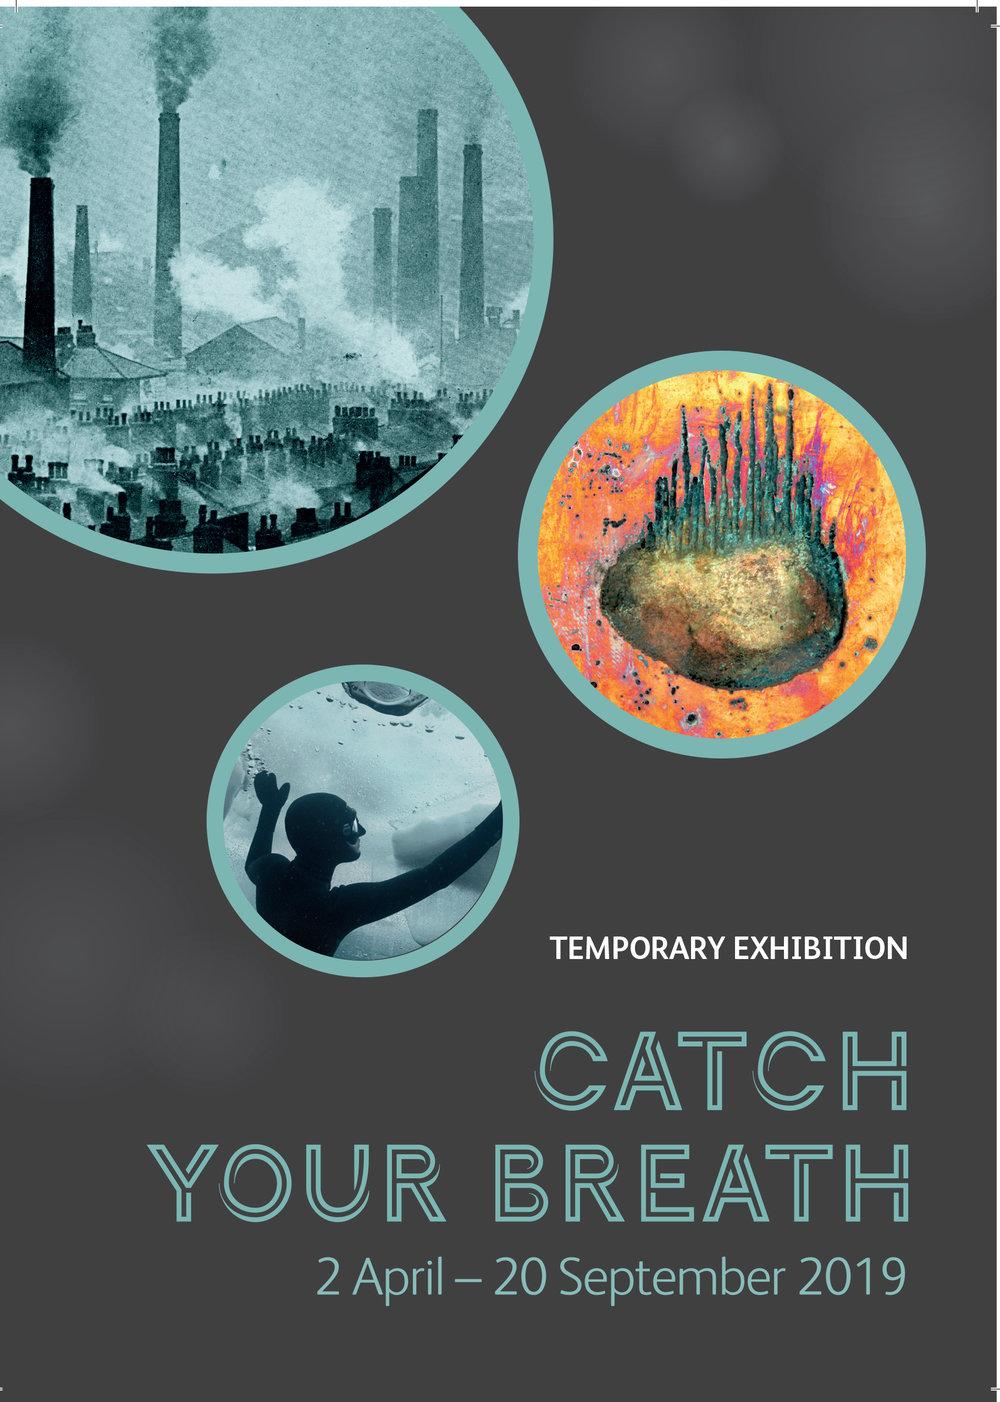 catch your breath 1.jpg